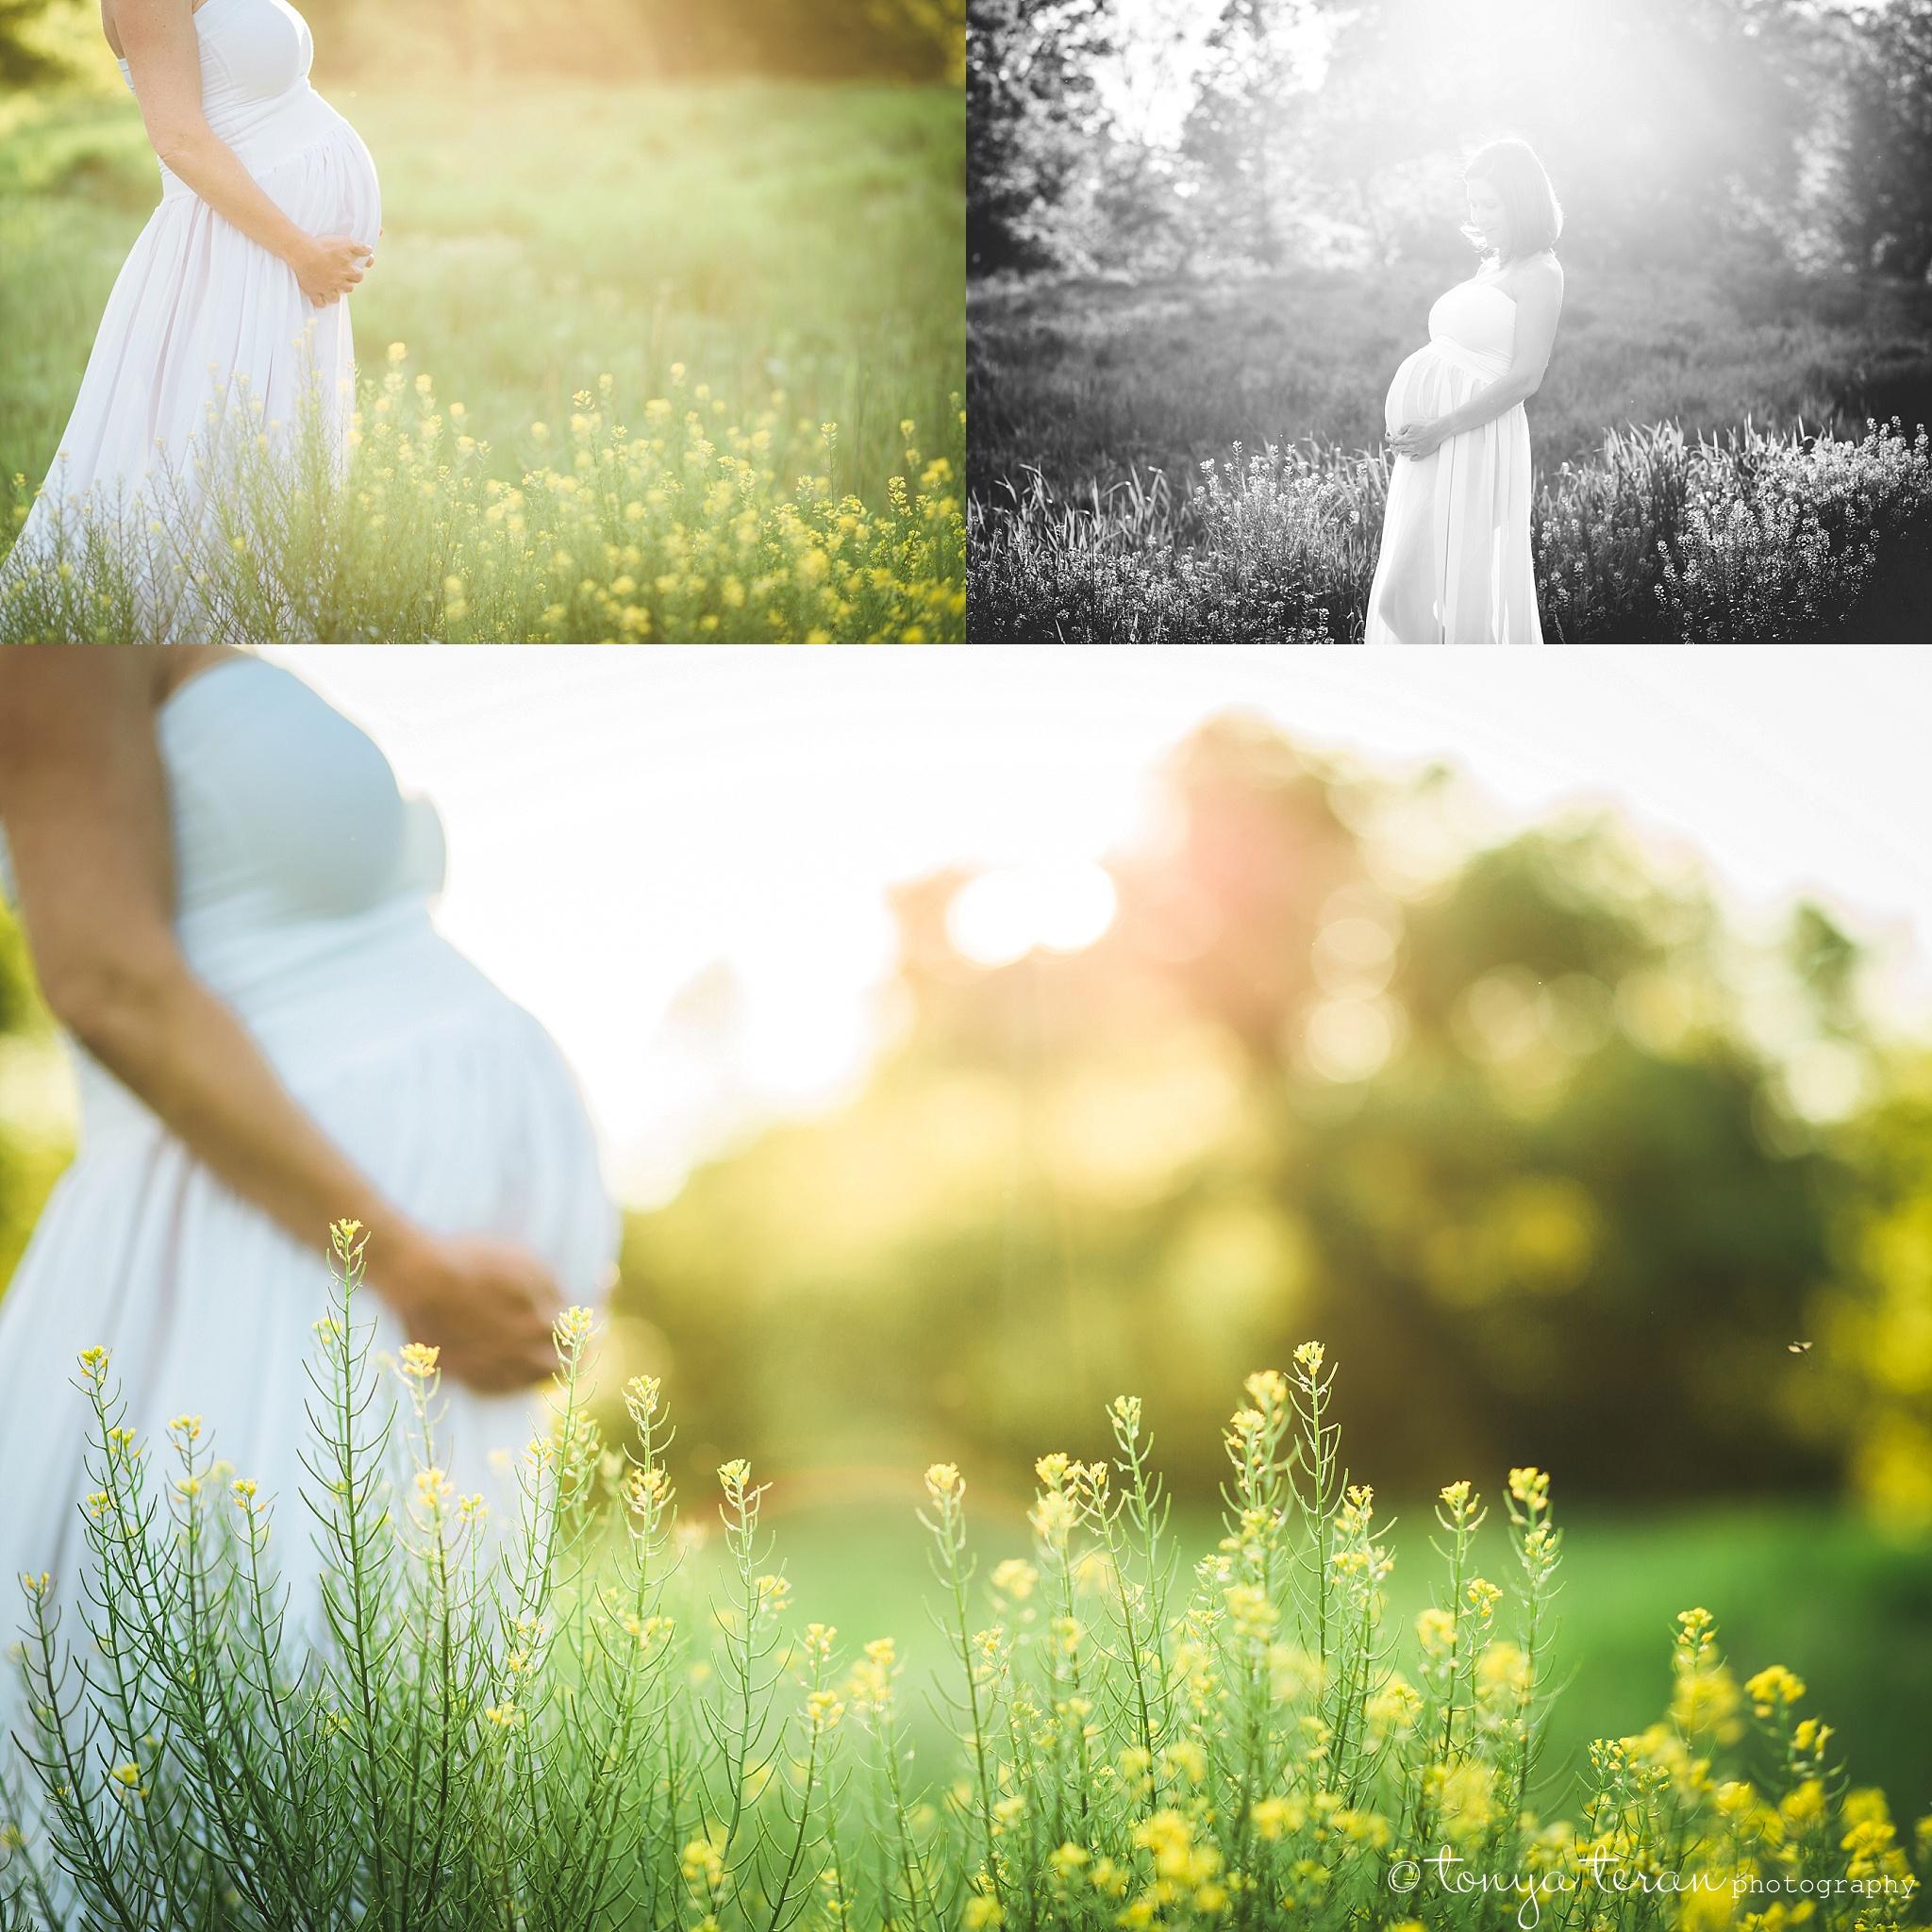 Mini Maternity Photo Session   Tonya Teran Photography, Bethesda, MD Newborn, Baby, and Family Photographer